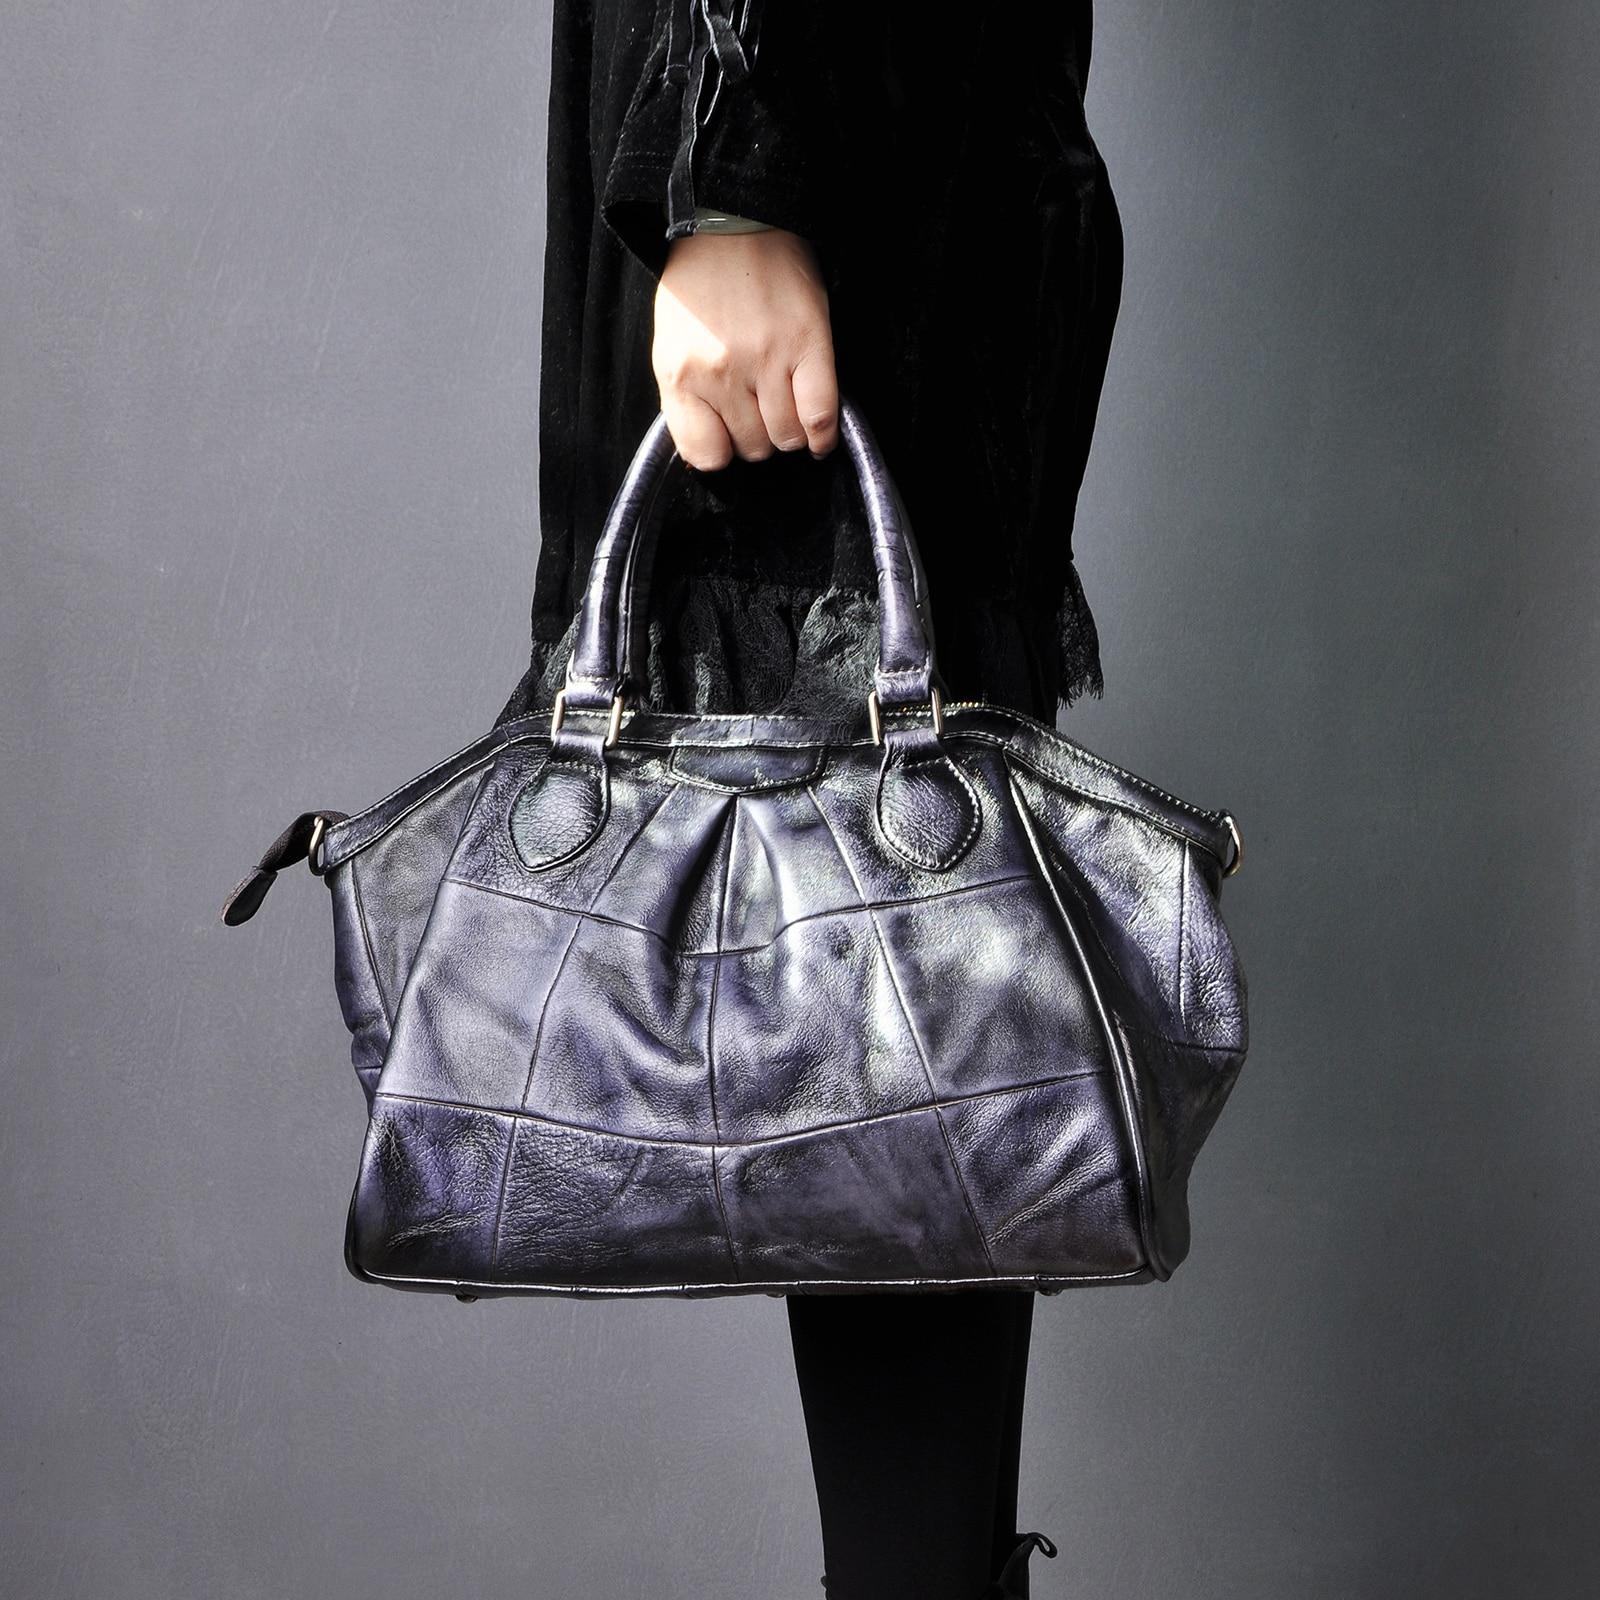 Qualidade de Couro Bolsa de Ombro para Feminino Casual Desinger Bolsa Mensageiro Moda ol Elegante Bolsala 804217-b